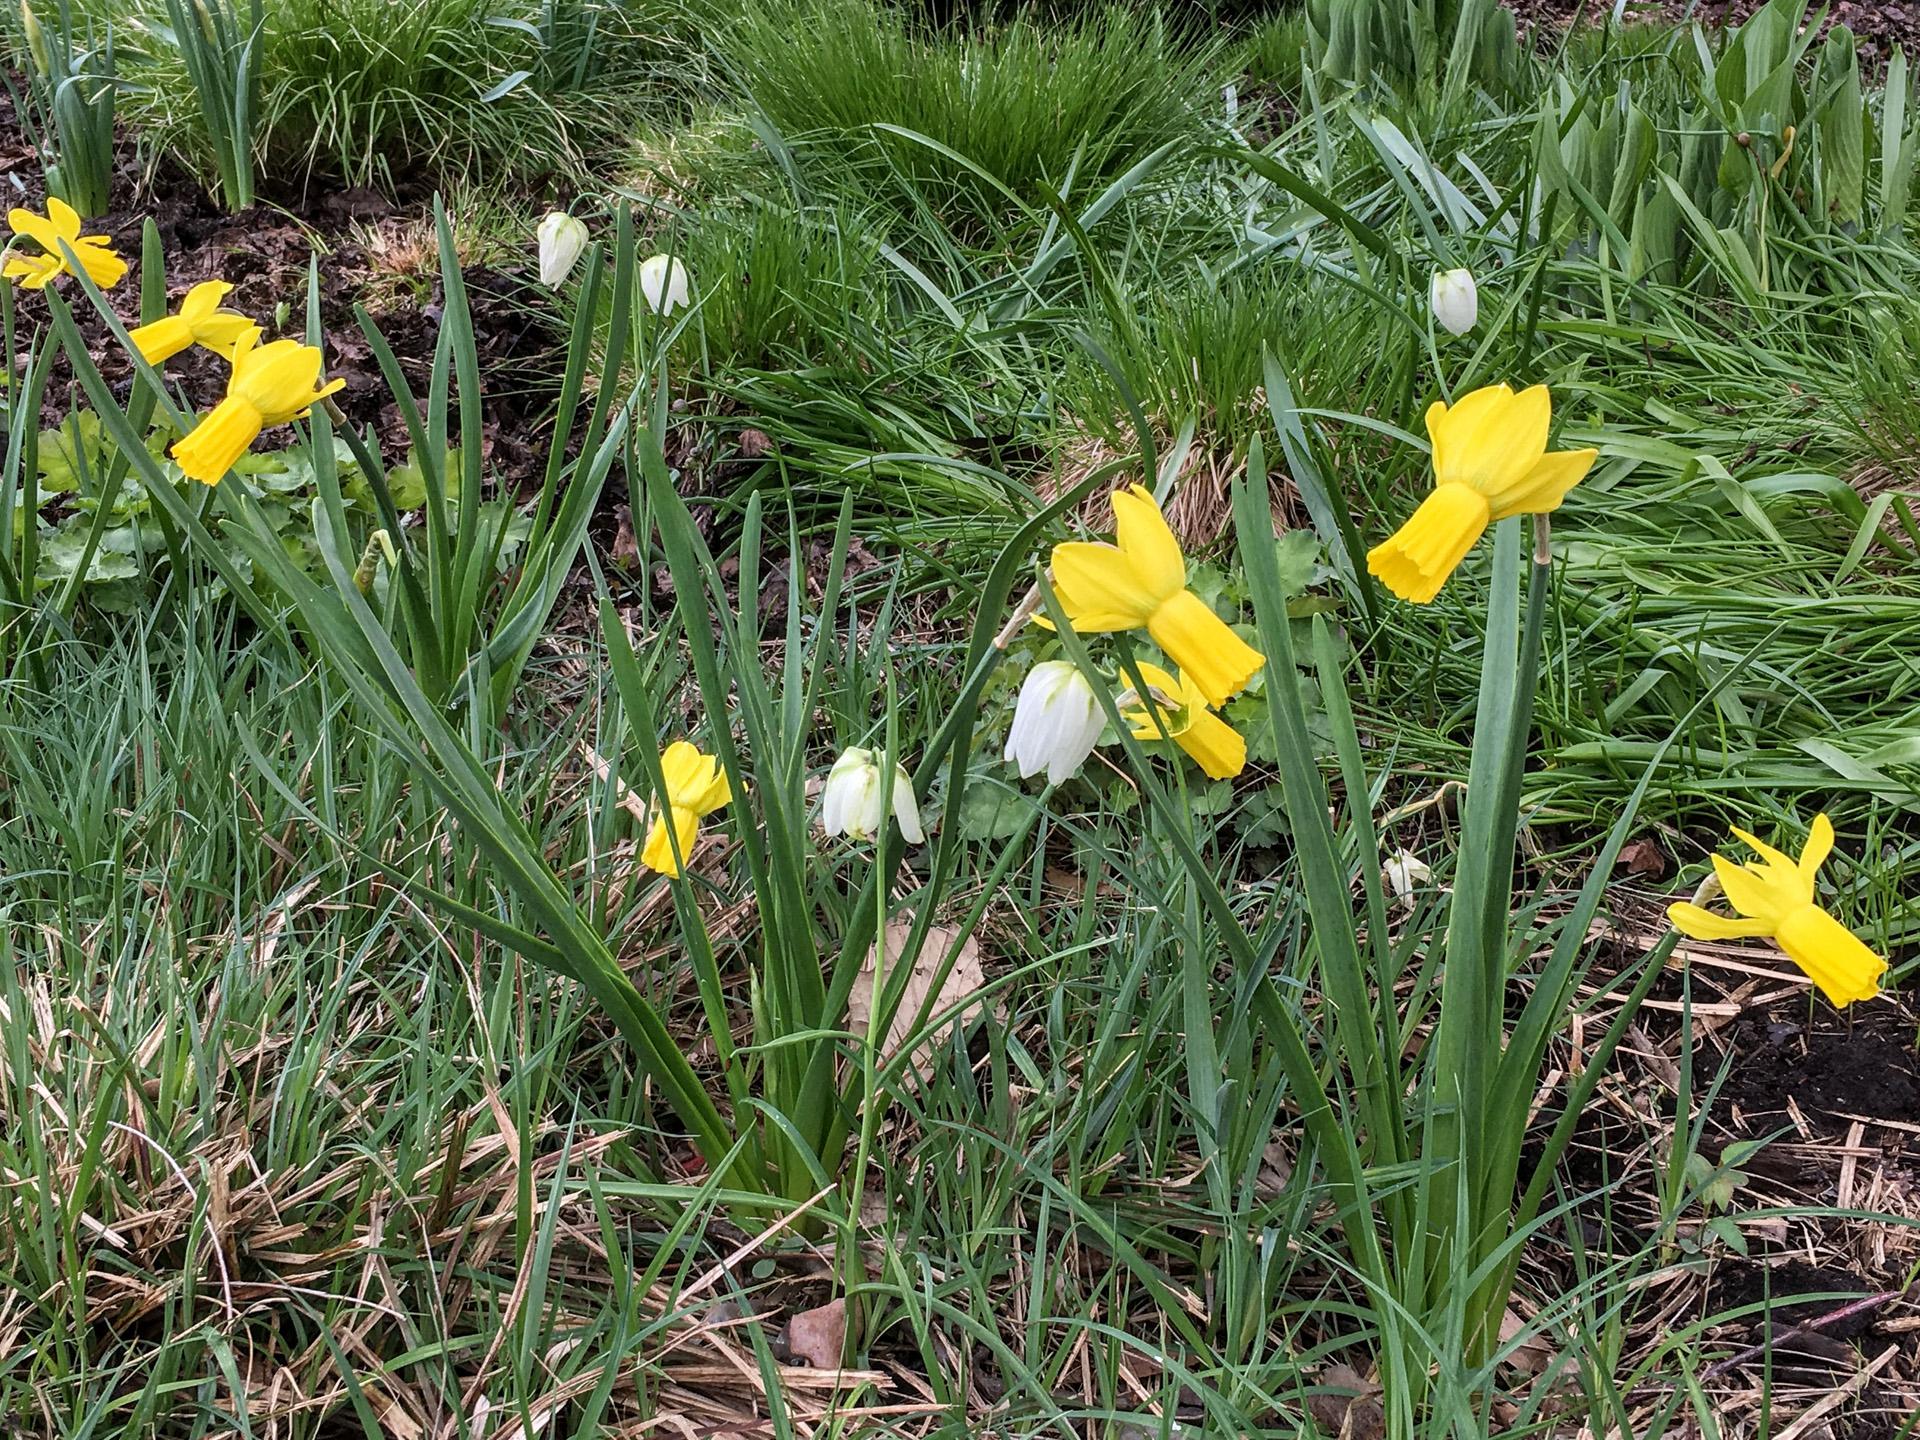 'Rapture' daffodil, small yello flowered daffodil